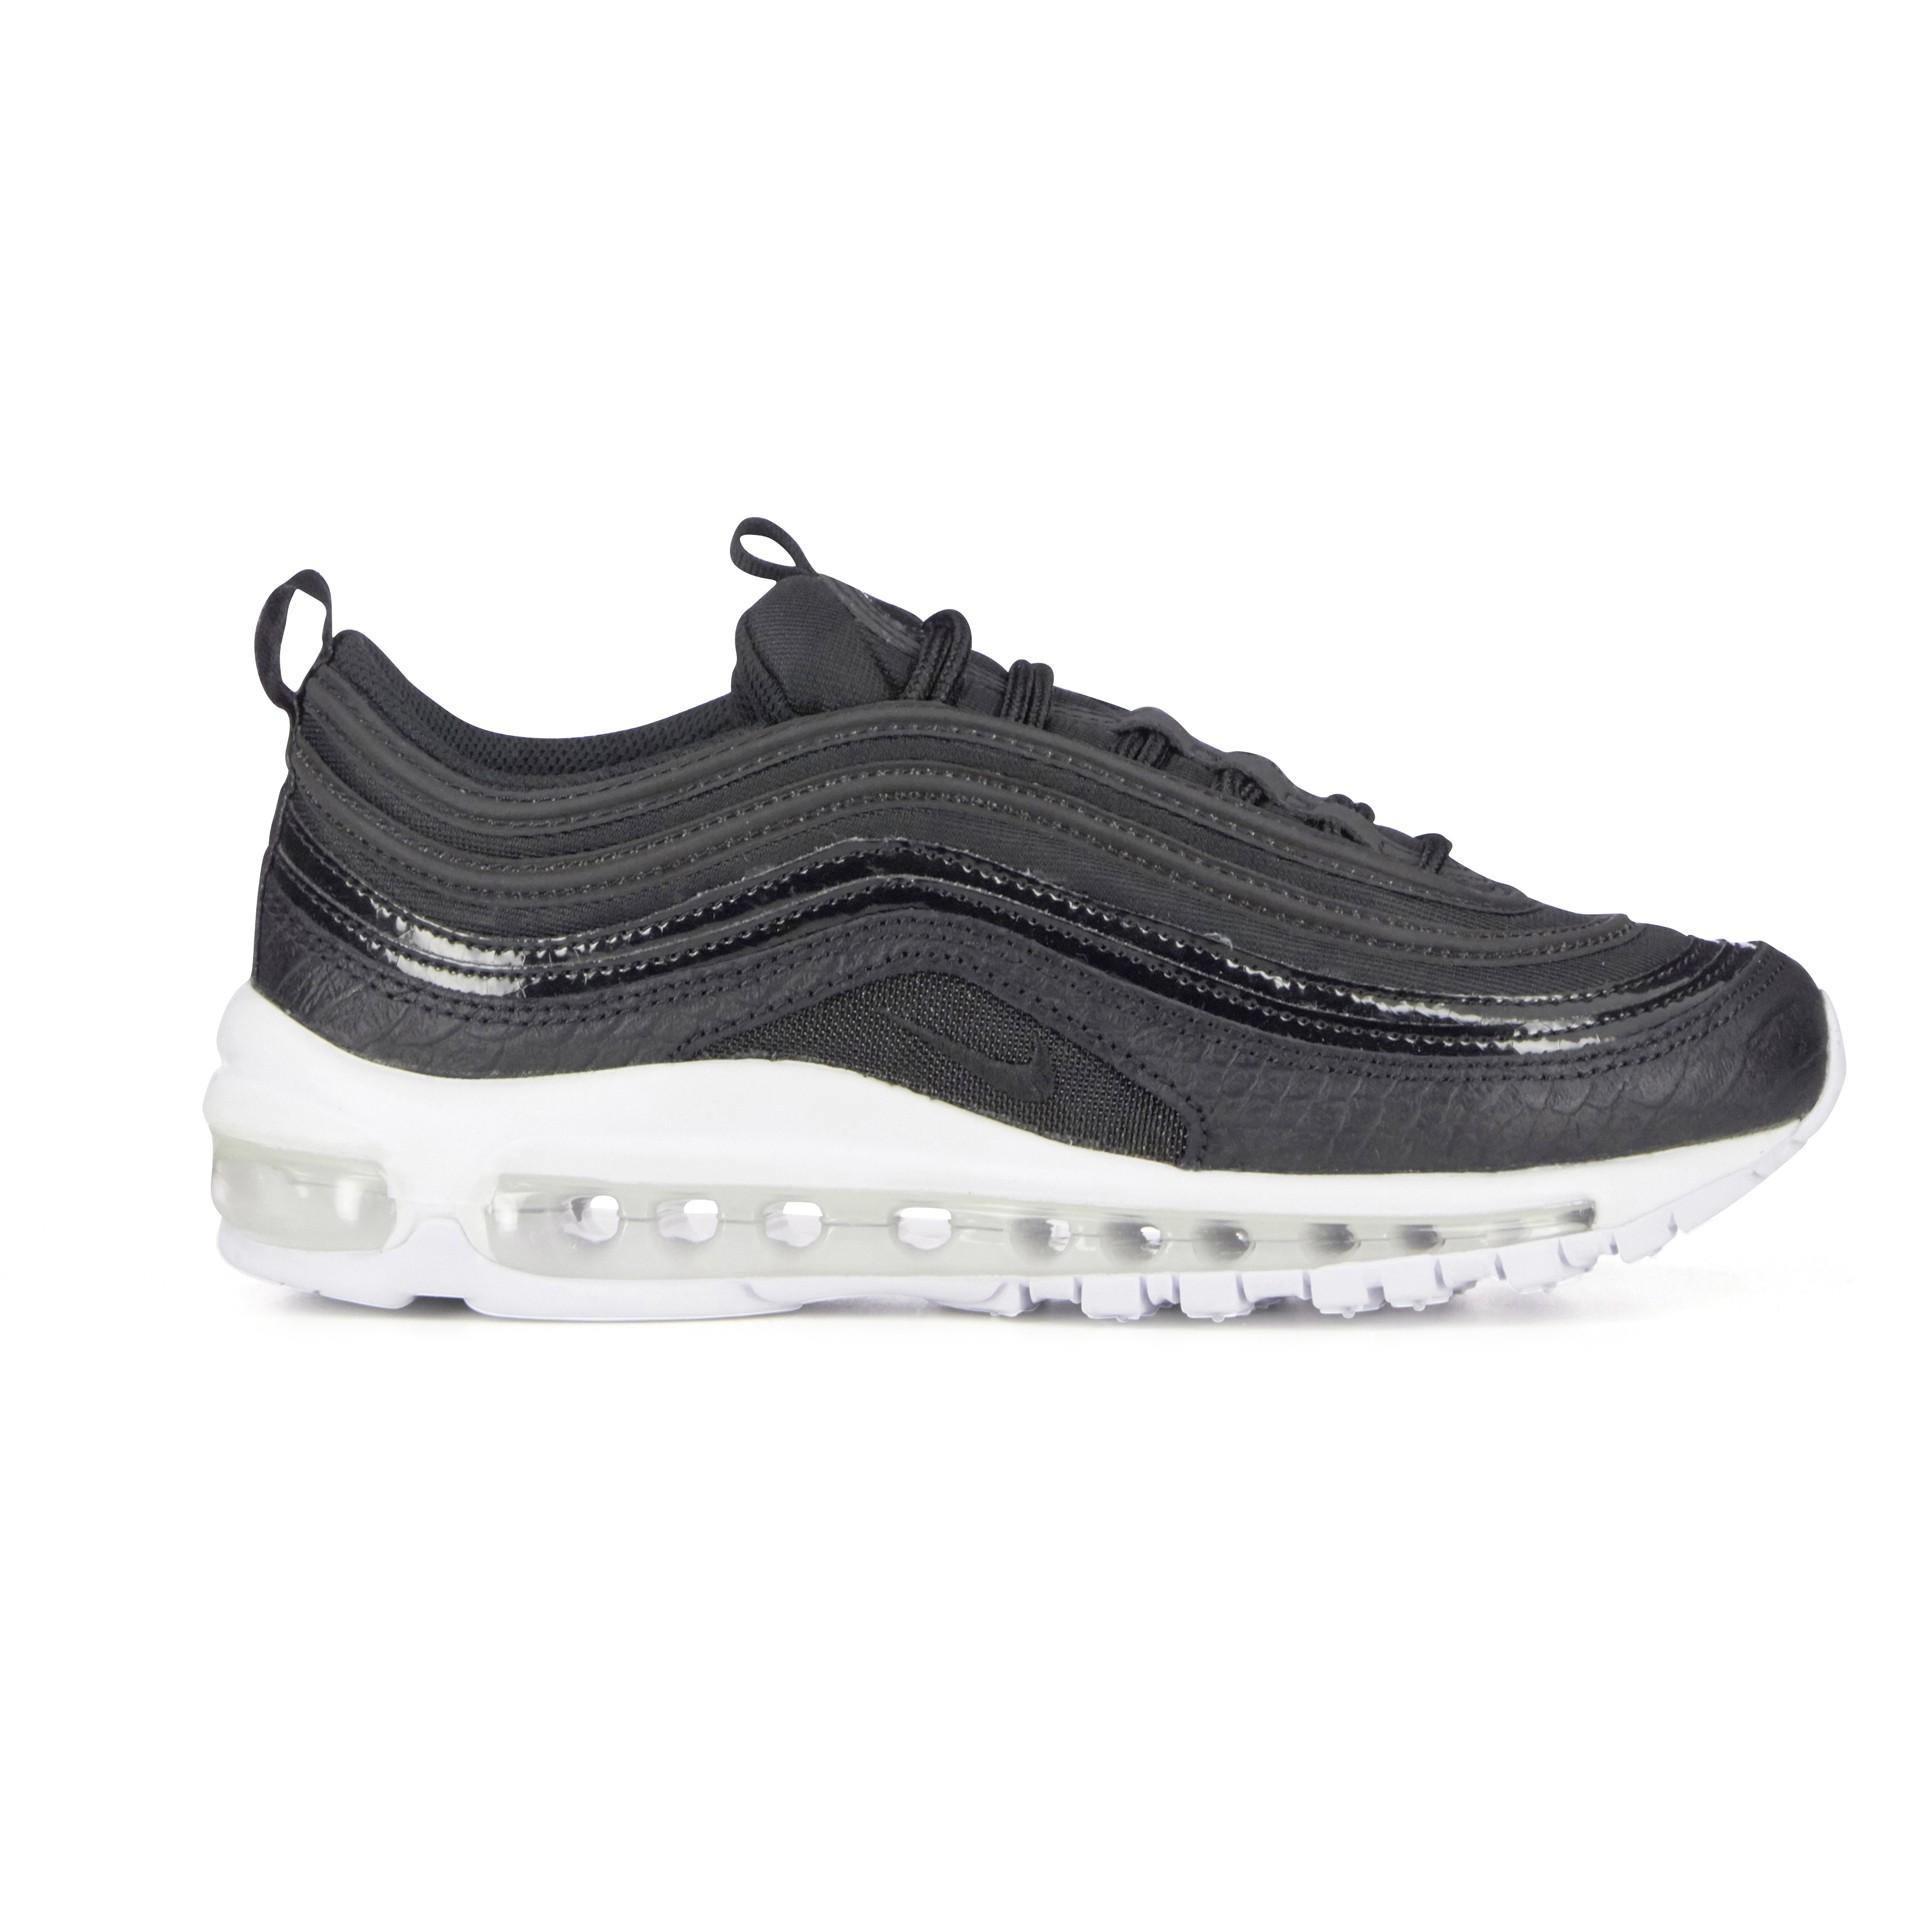 new product 78d6d e56f8 Chaussures Nike Prix Pas Cher Pour Homme Nike Air Max 97 Premium Blanc  312834-004 .